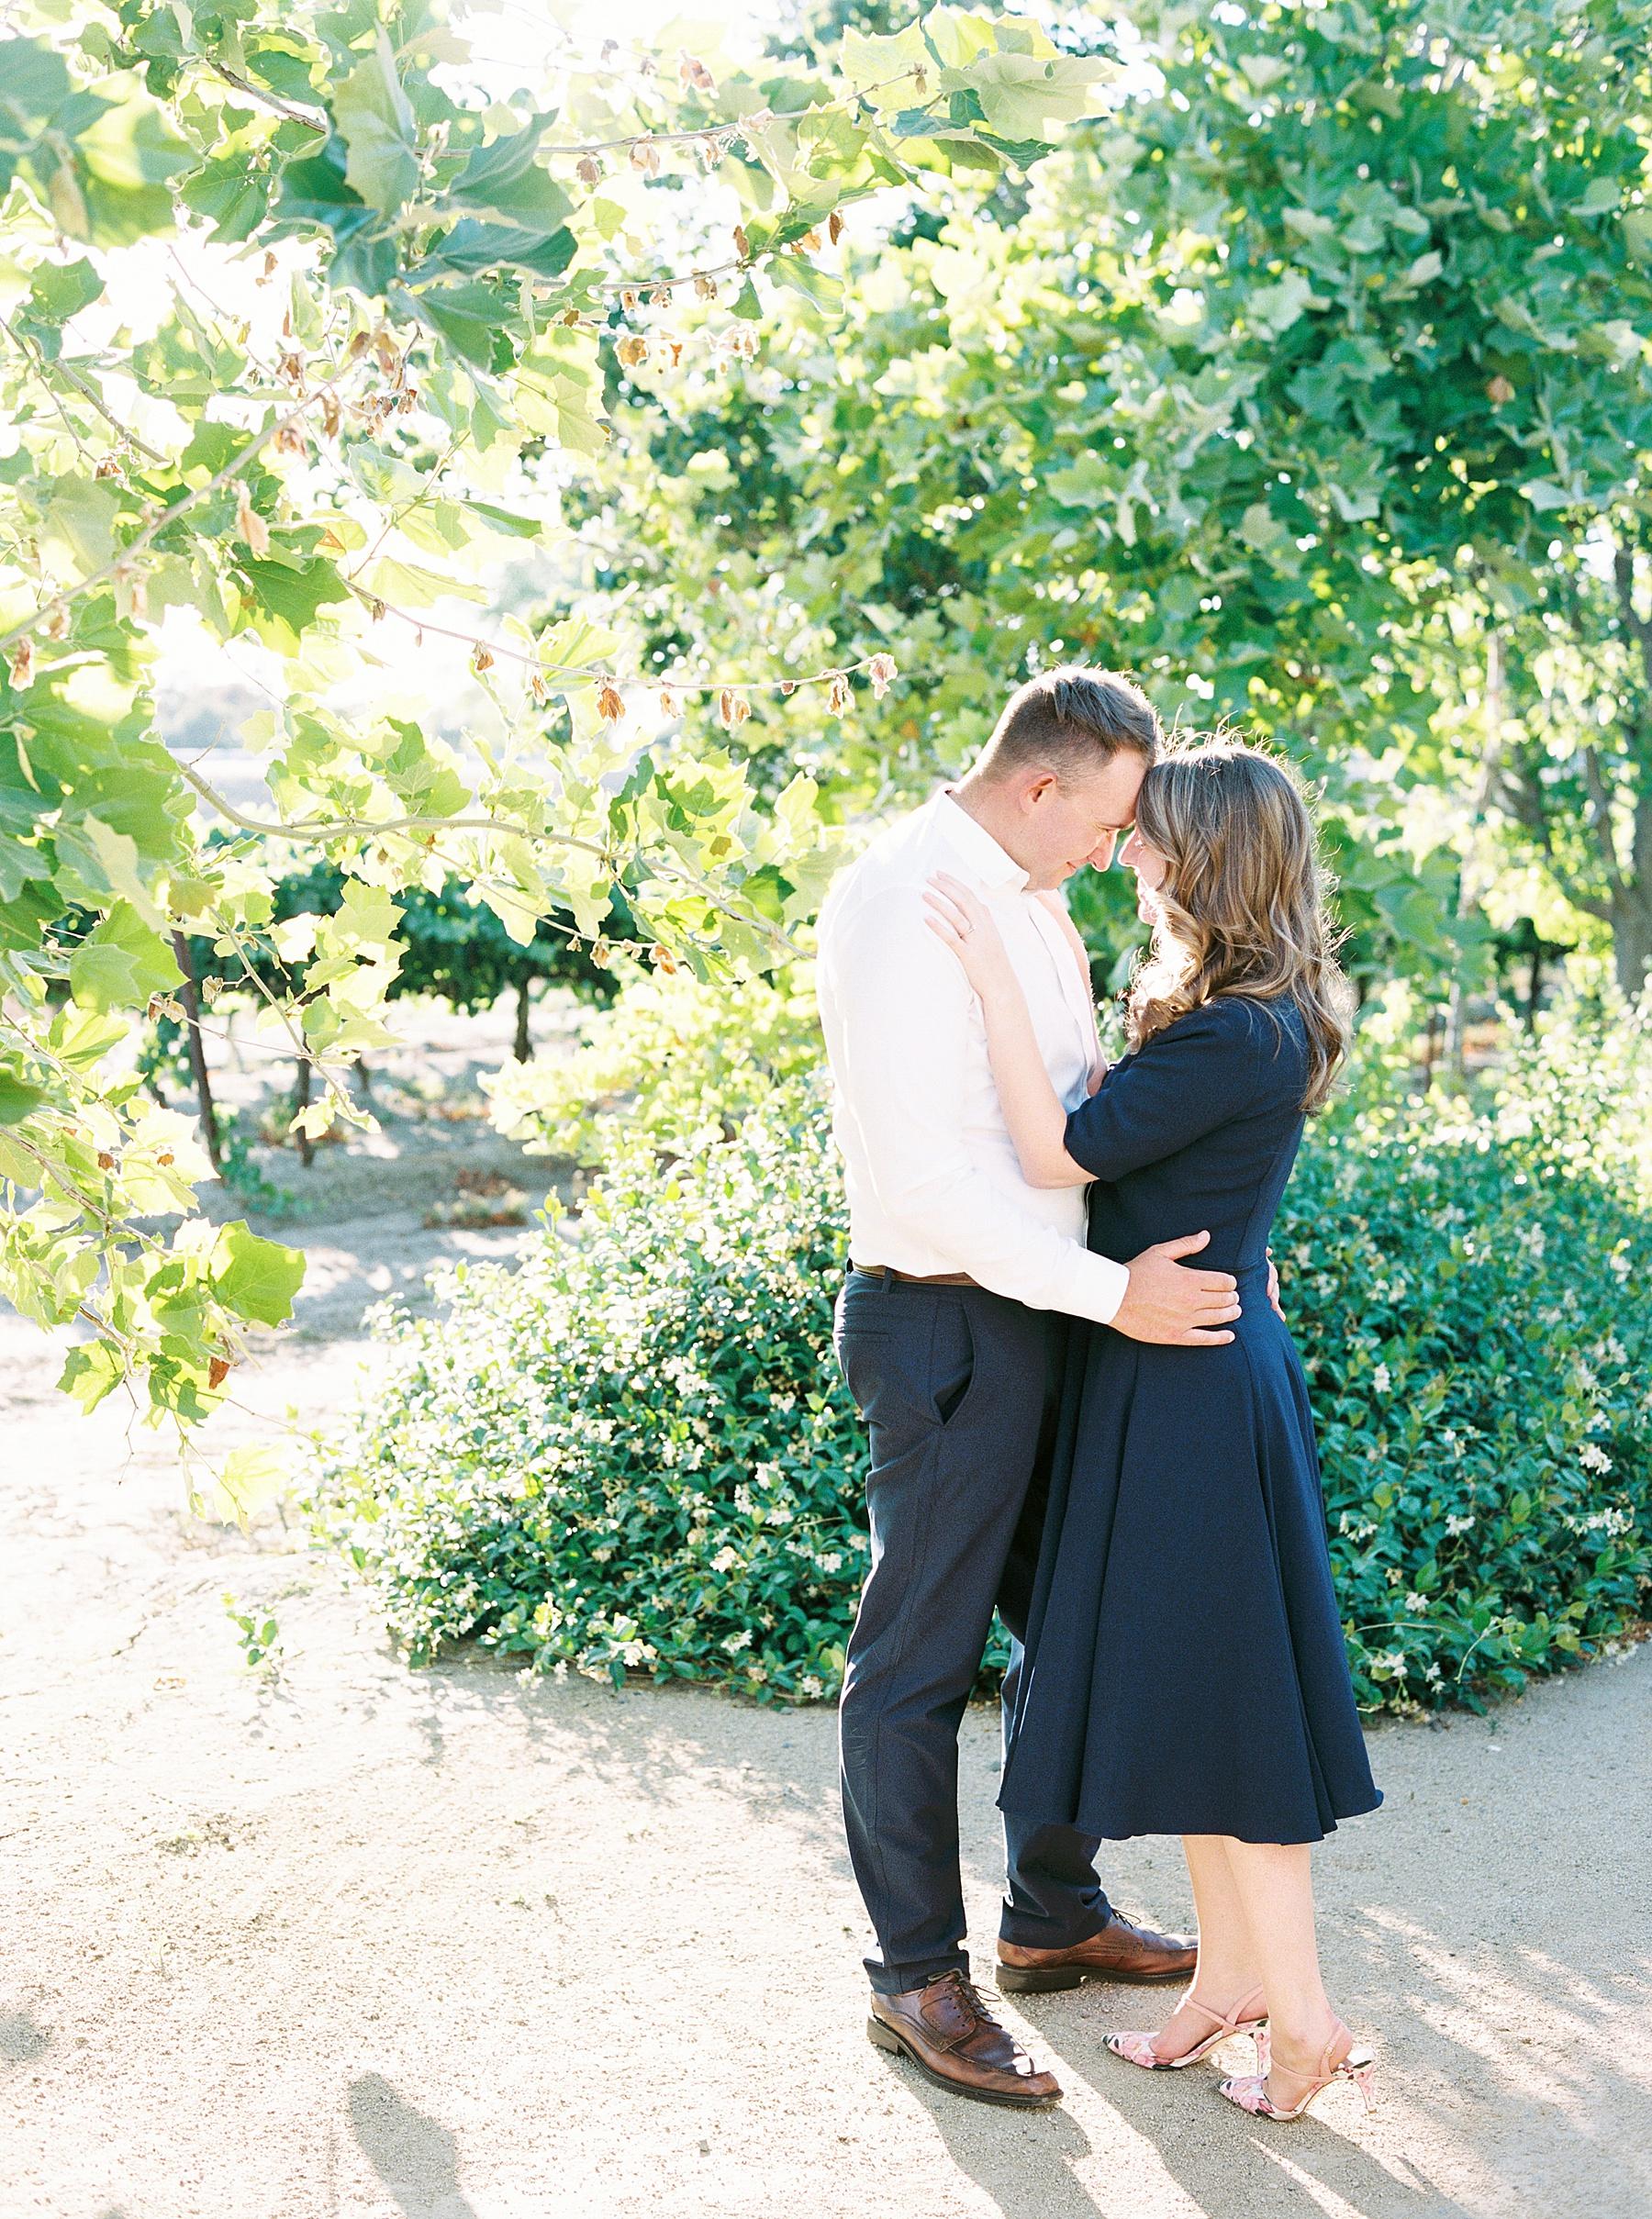 Scribner Bend Winery Engagement Session - Courtney and Steven - Ashley Baumgartner - Sribner Bend Wedding Photographer - Sacramento Wedding Photographer_0001.jpg